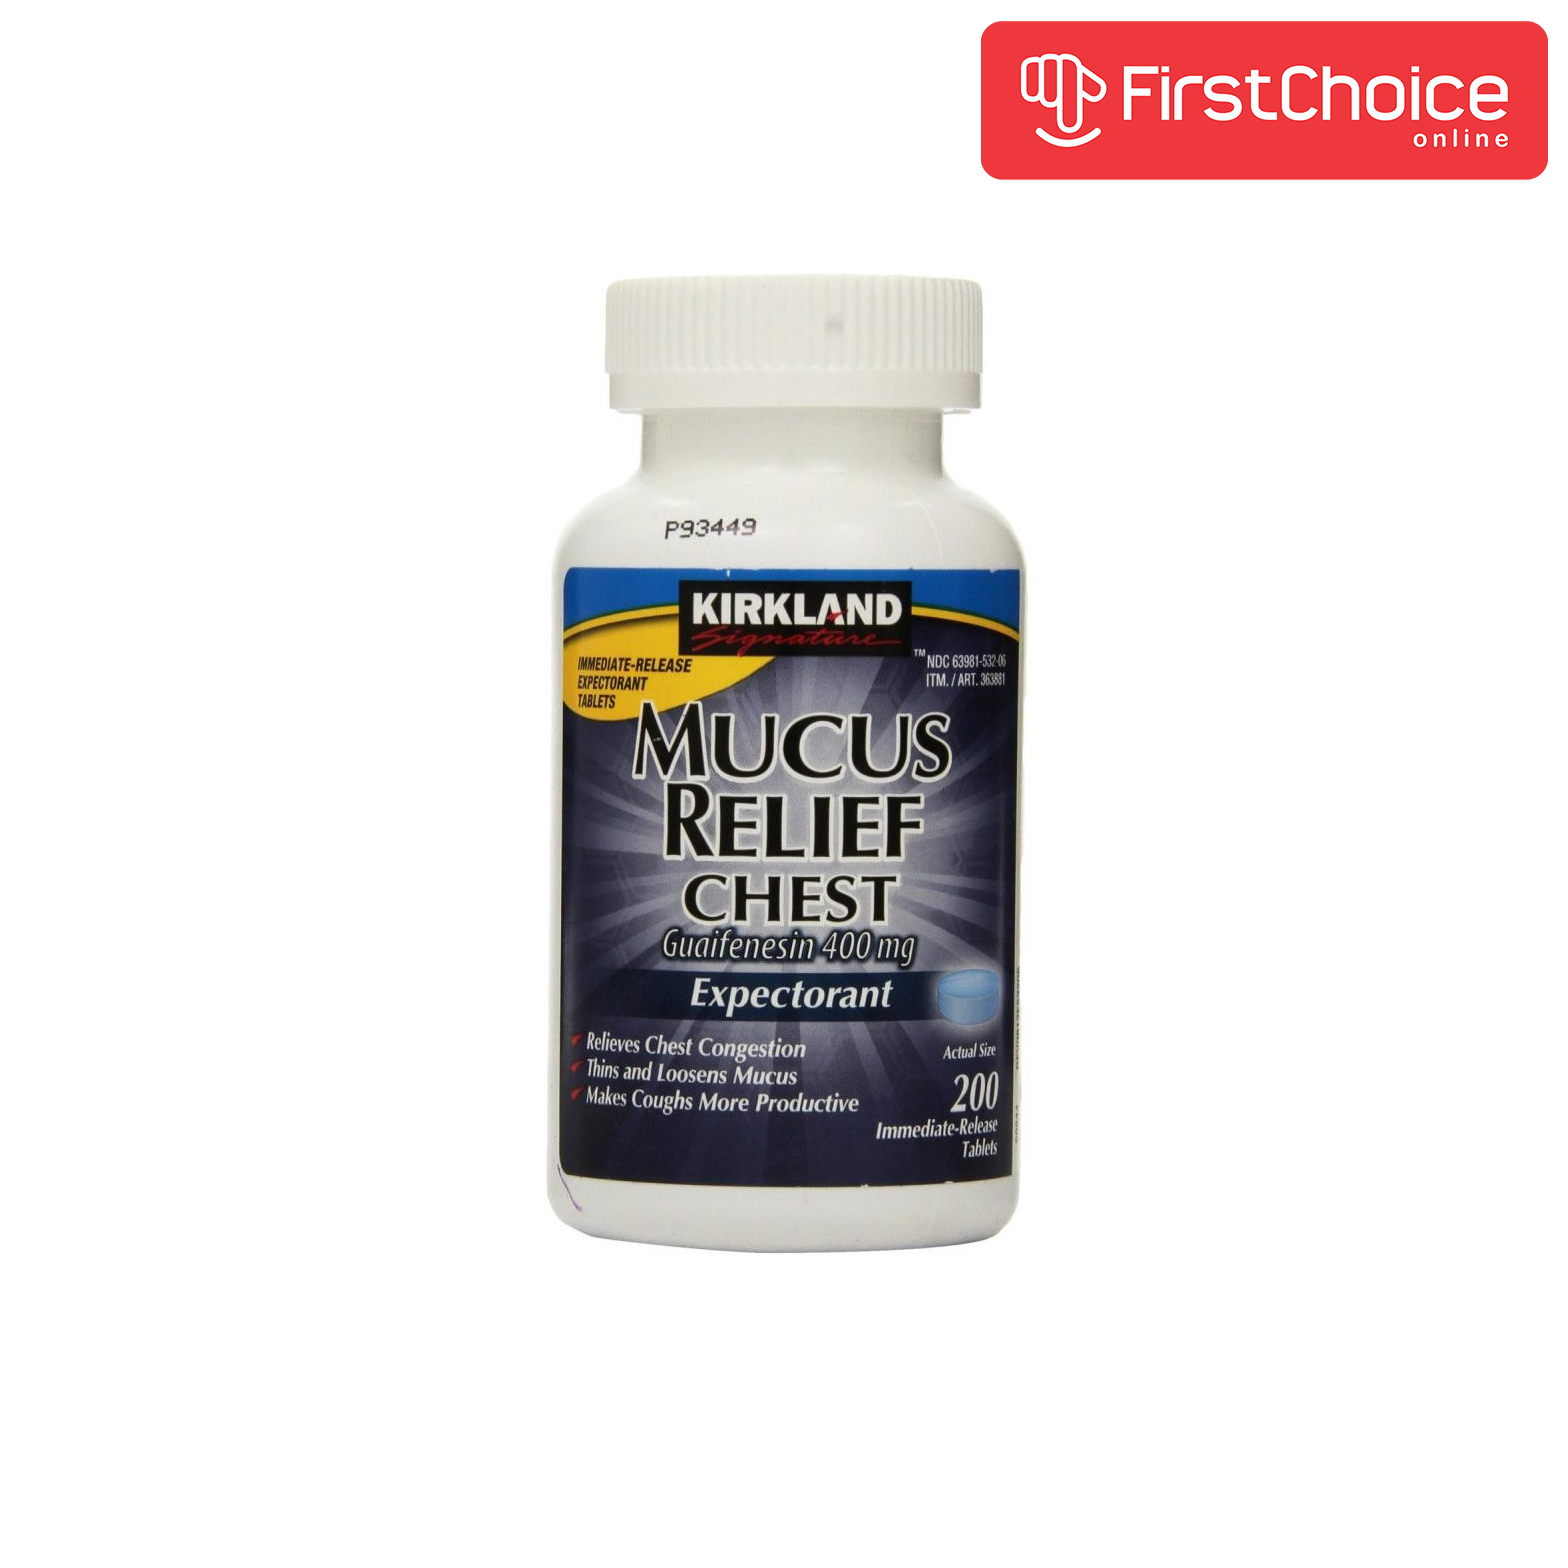 Kirkland Mucus Relief 400 mg Guaifenesin Relieves Chest ...